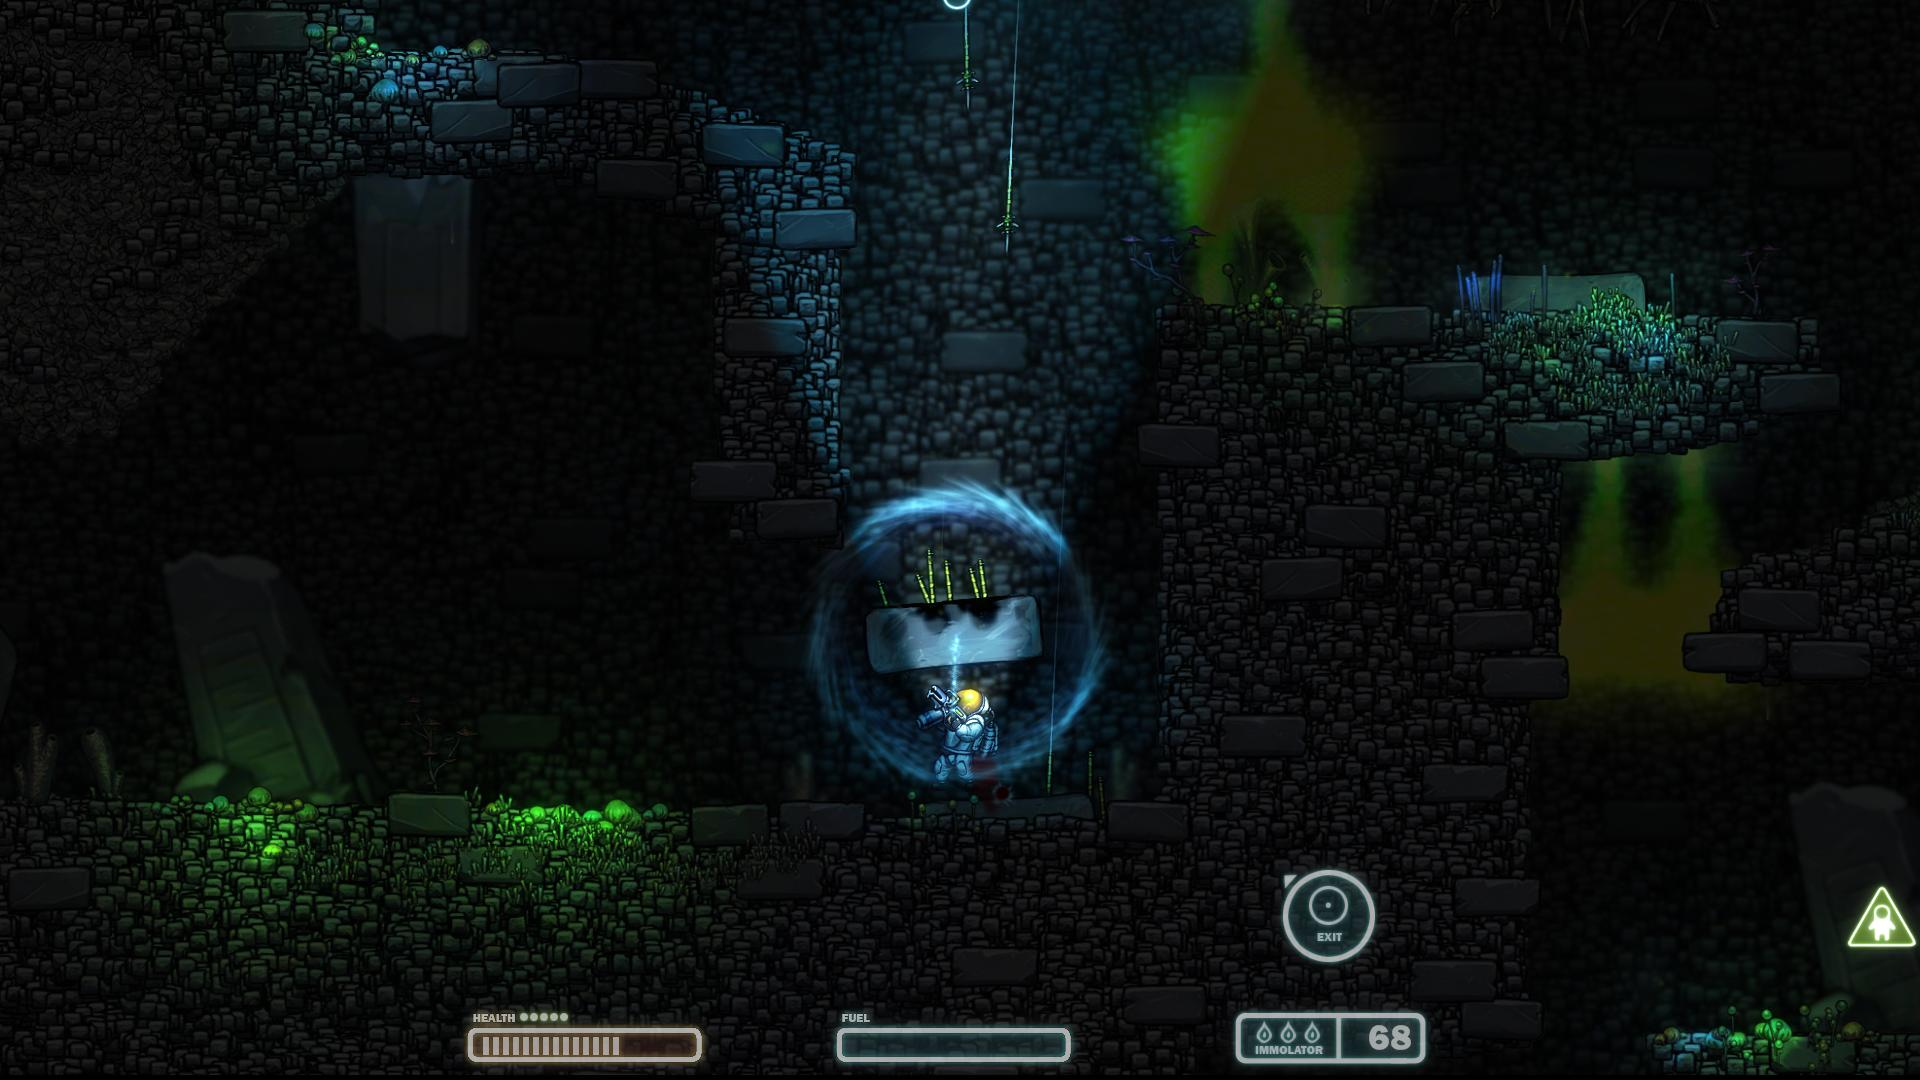 Capsized screenshot